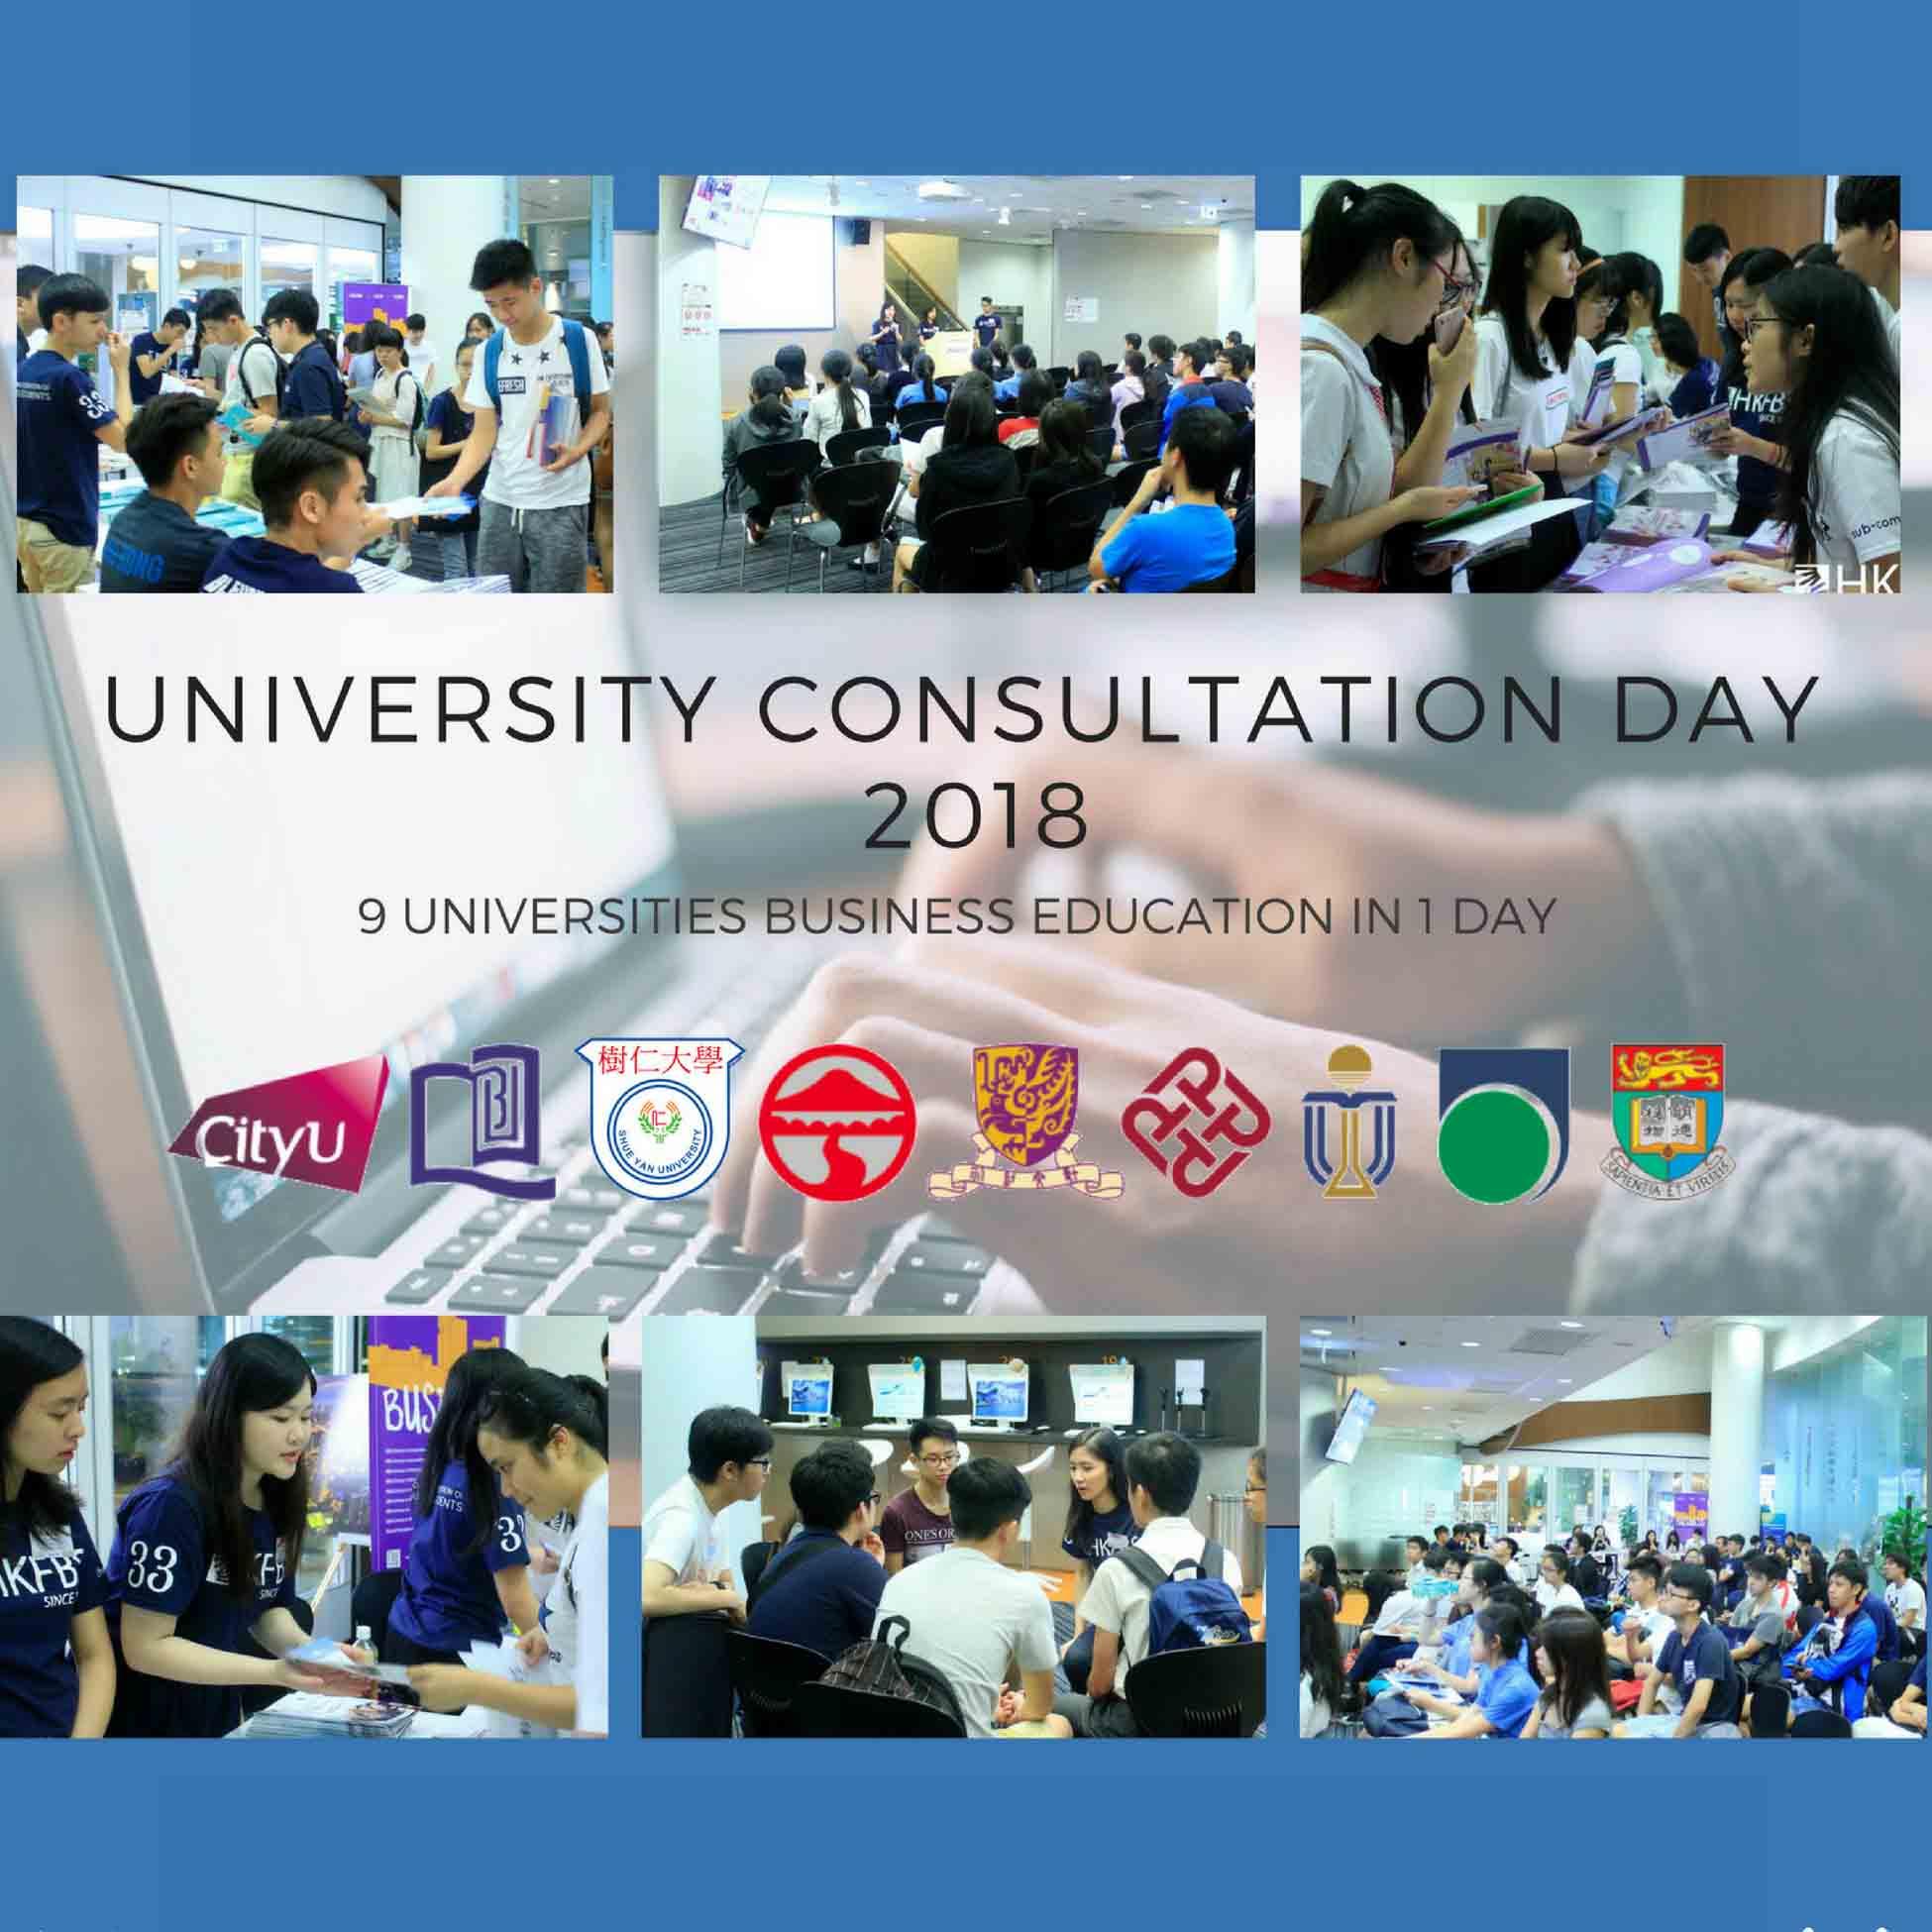 University Consultation Day